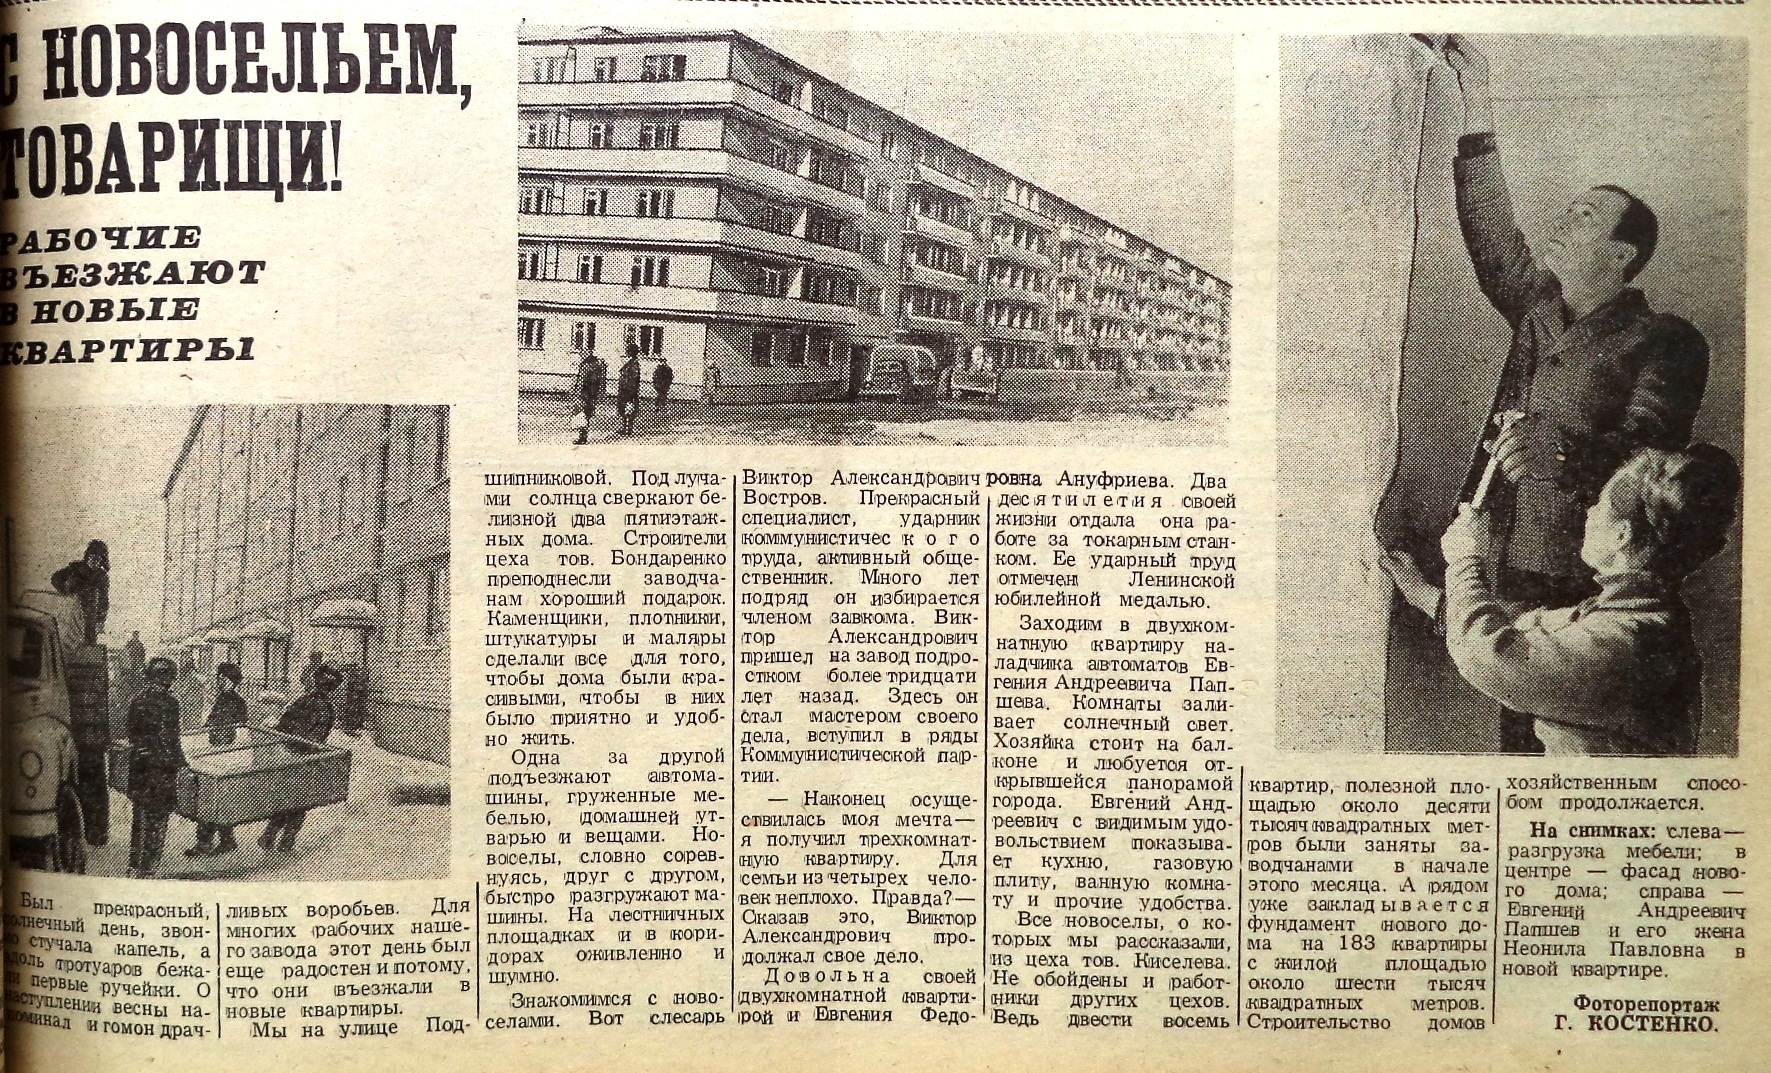 Подшипниковая-ФОТО-47-Знамя Труда-1973-23 марта